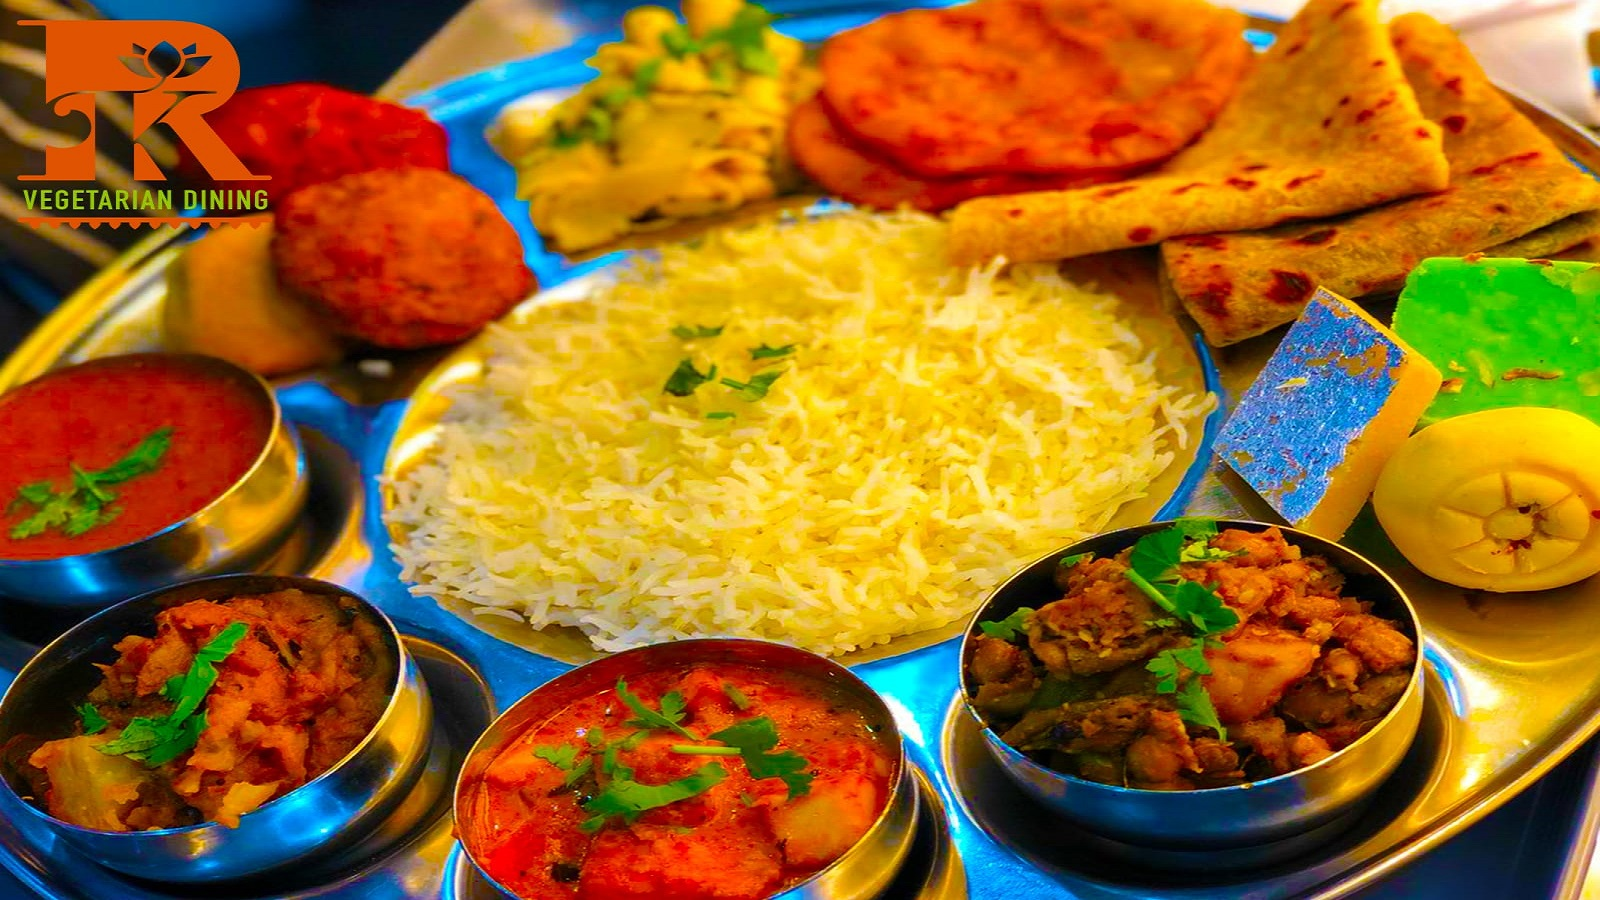 RK Dining